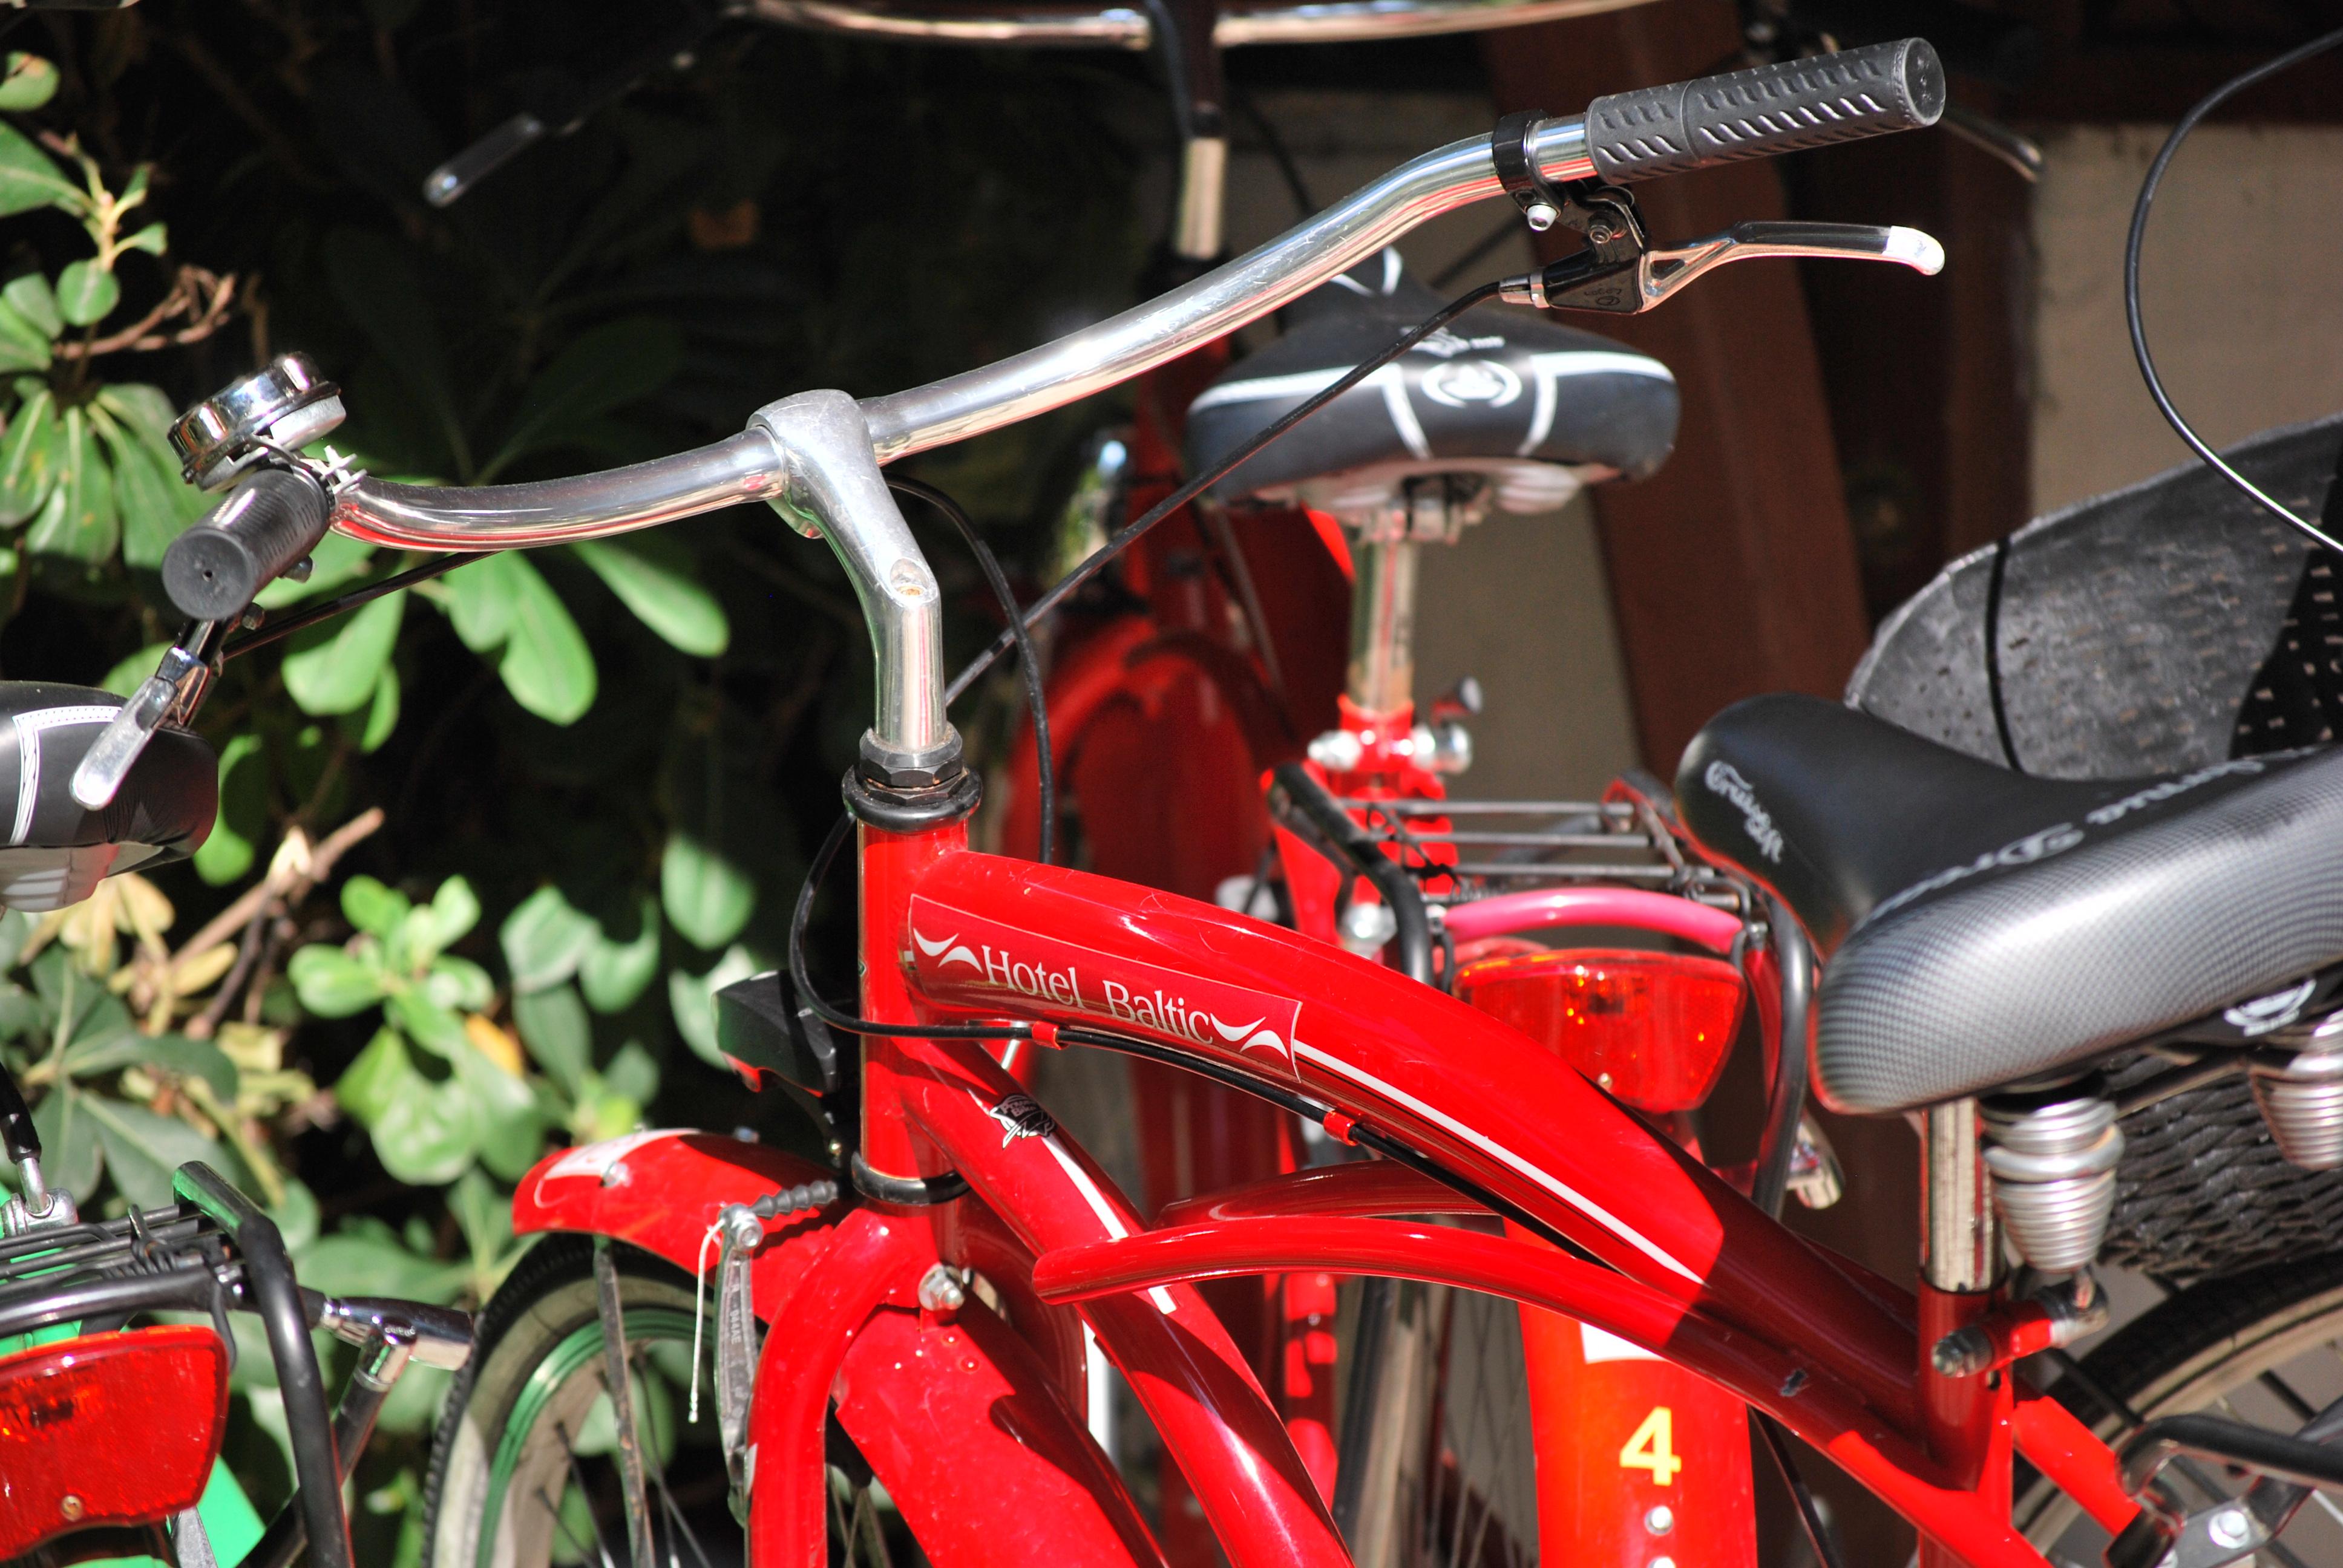 Hotel Baltic - Biciclette